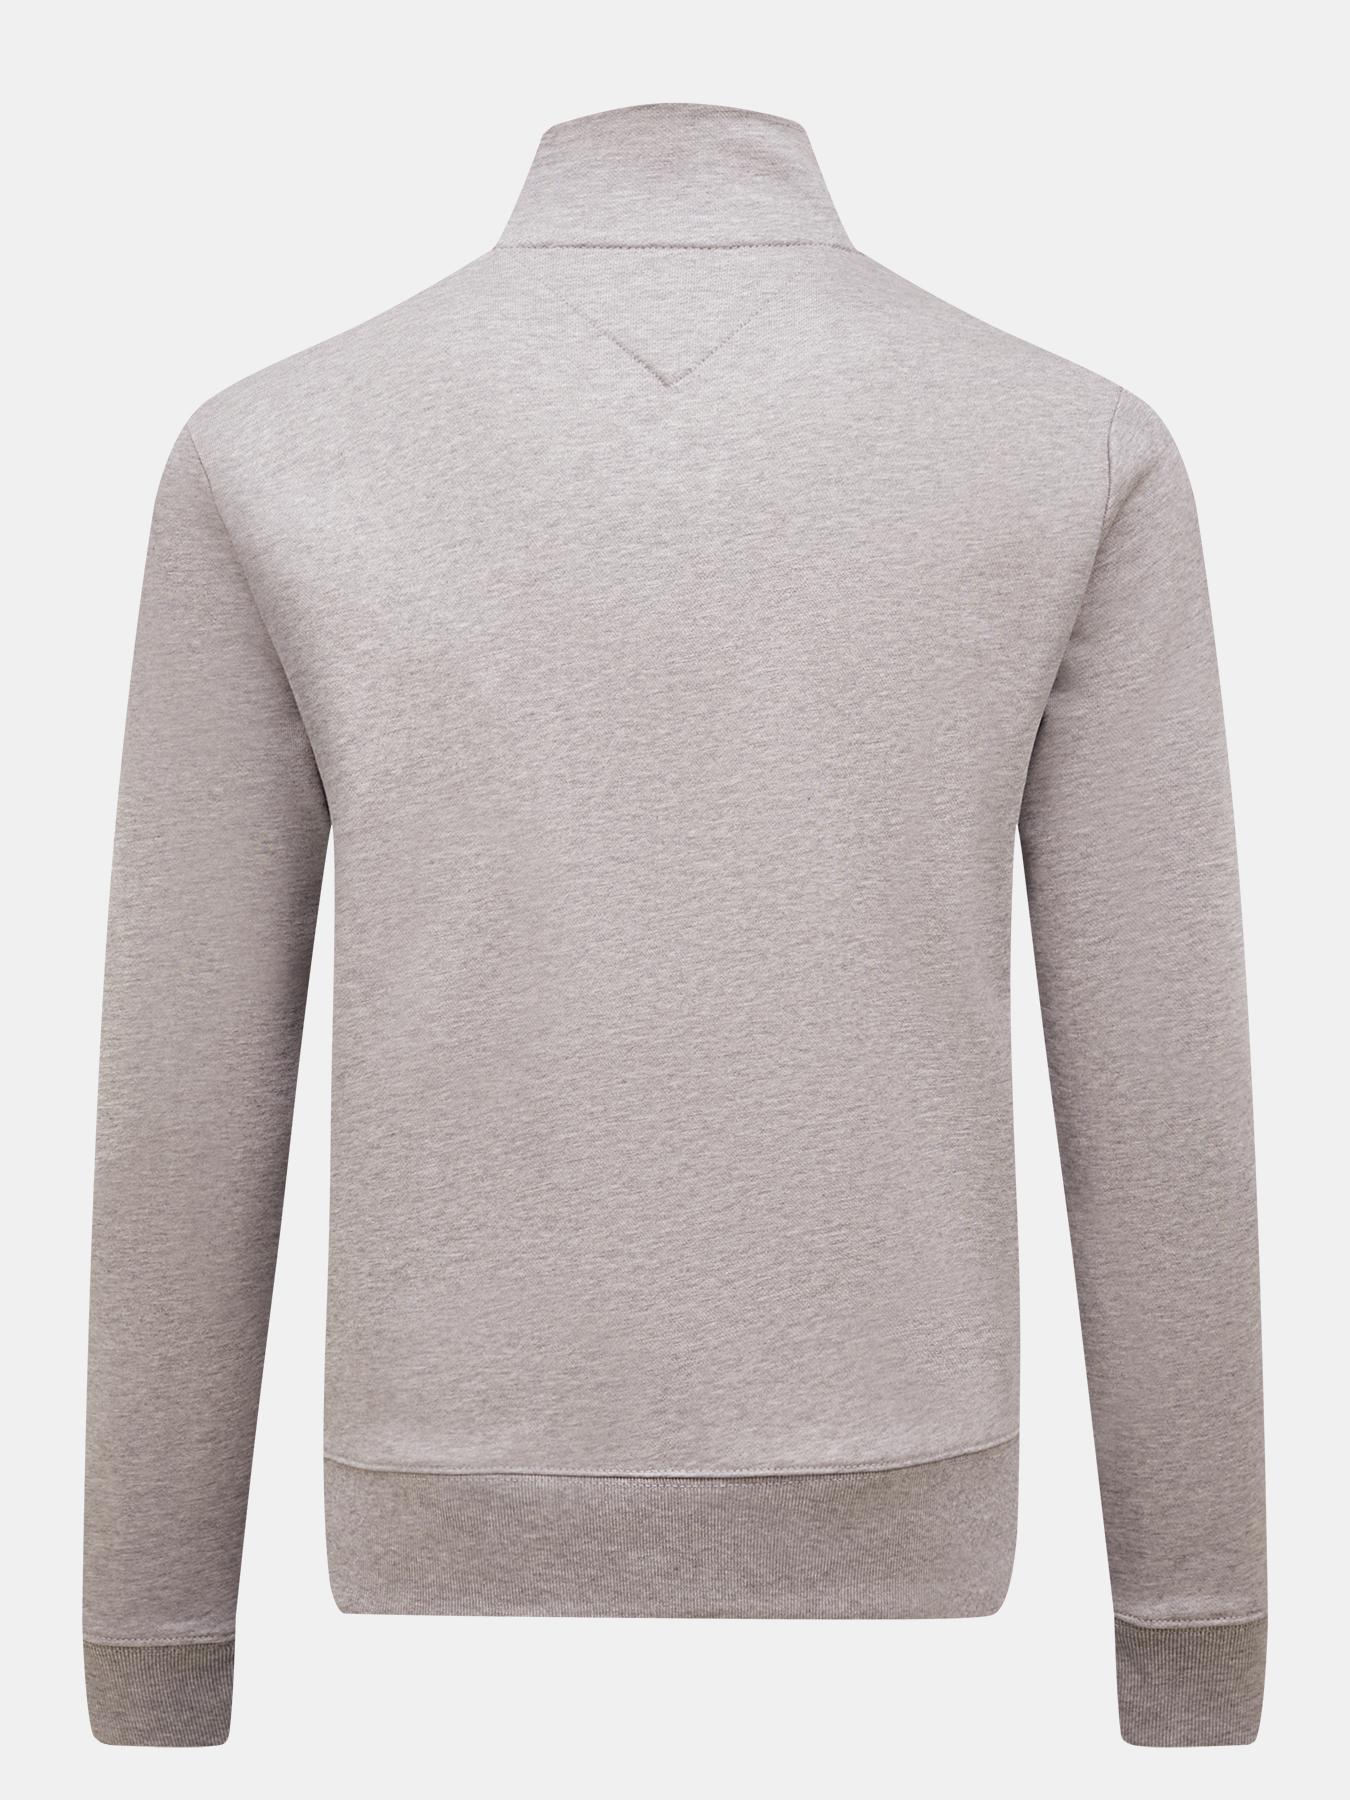 Куртка Tommy Hilfiger Олимпийка